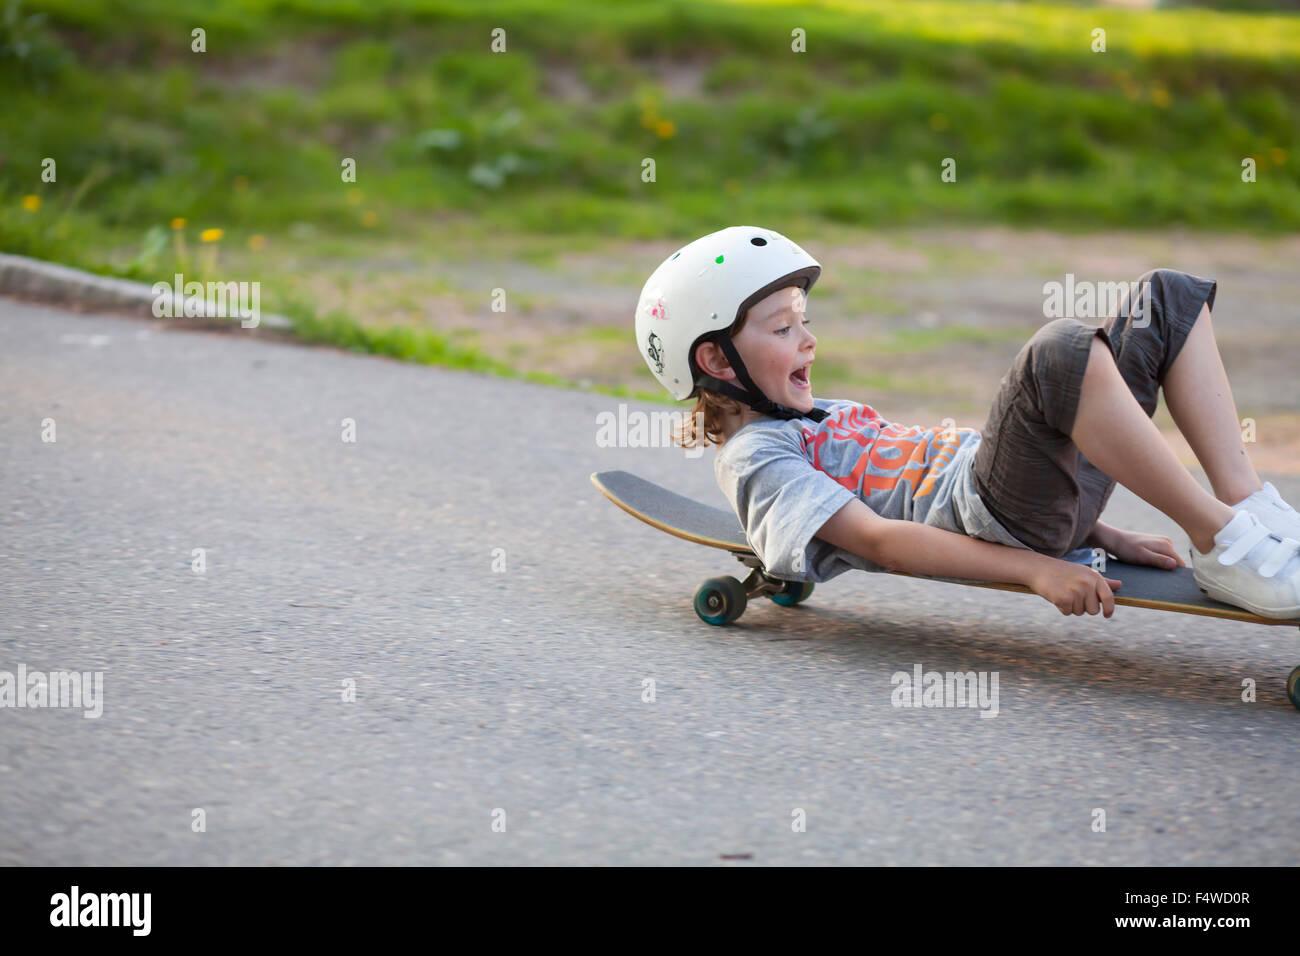 La Suède, Vastergotland, Lerum, Boy (8-9), le glissement vers le bas sur la rue skateboard Photo Stock